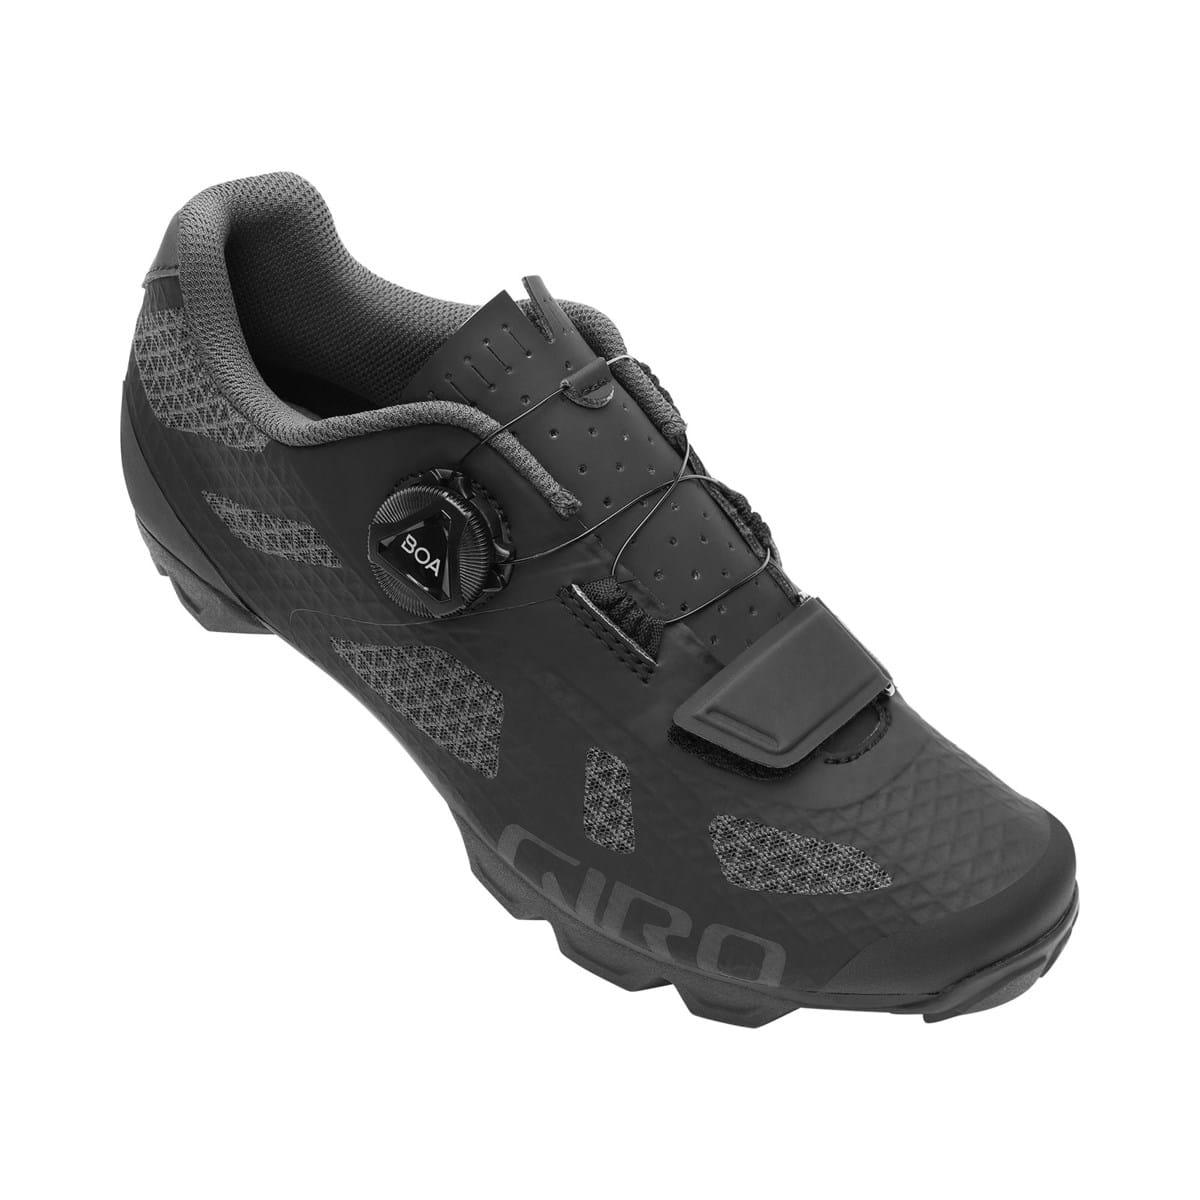 Rincon Women's MTB Cycling Shoes